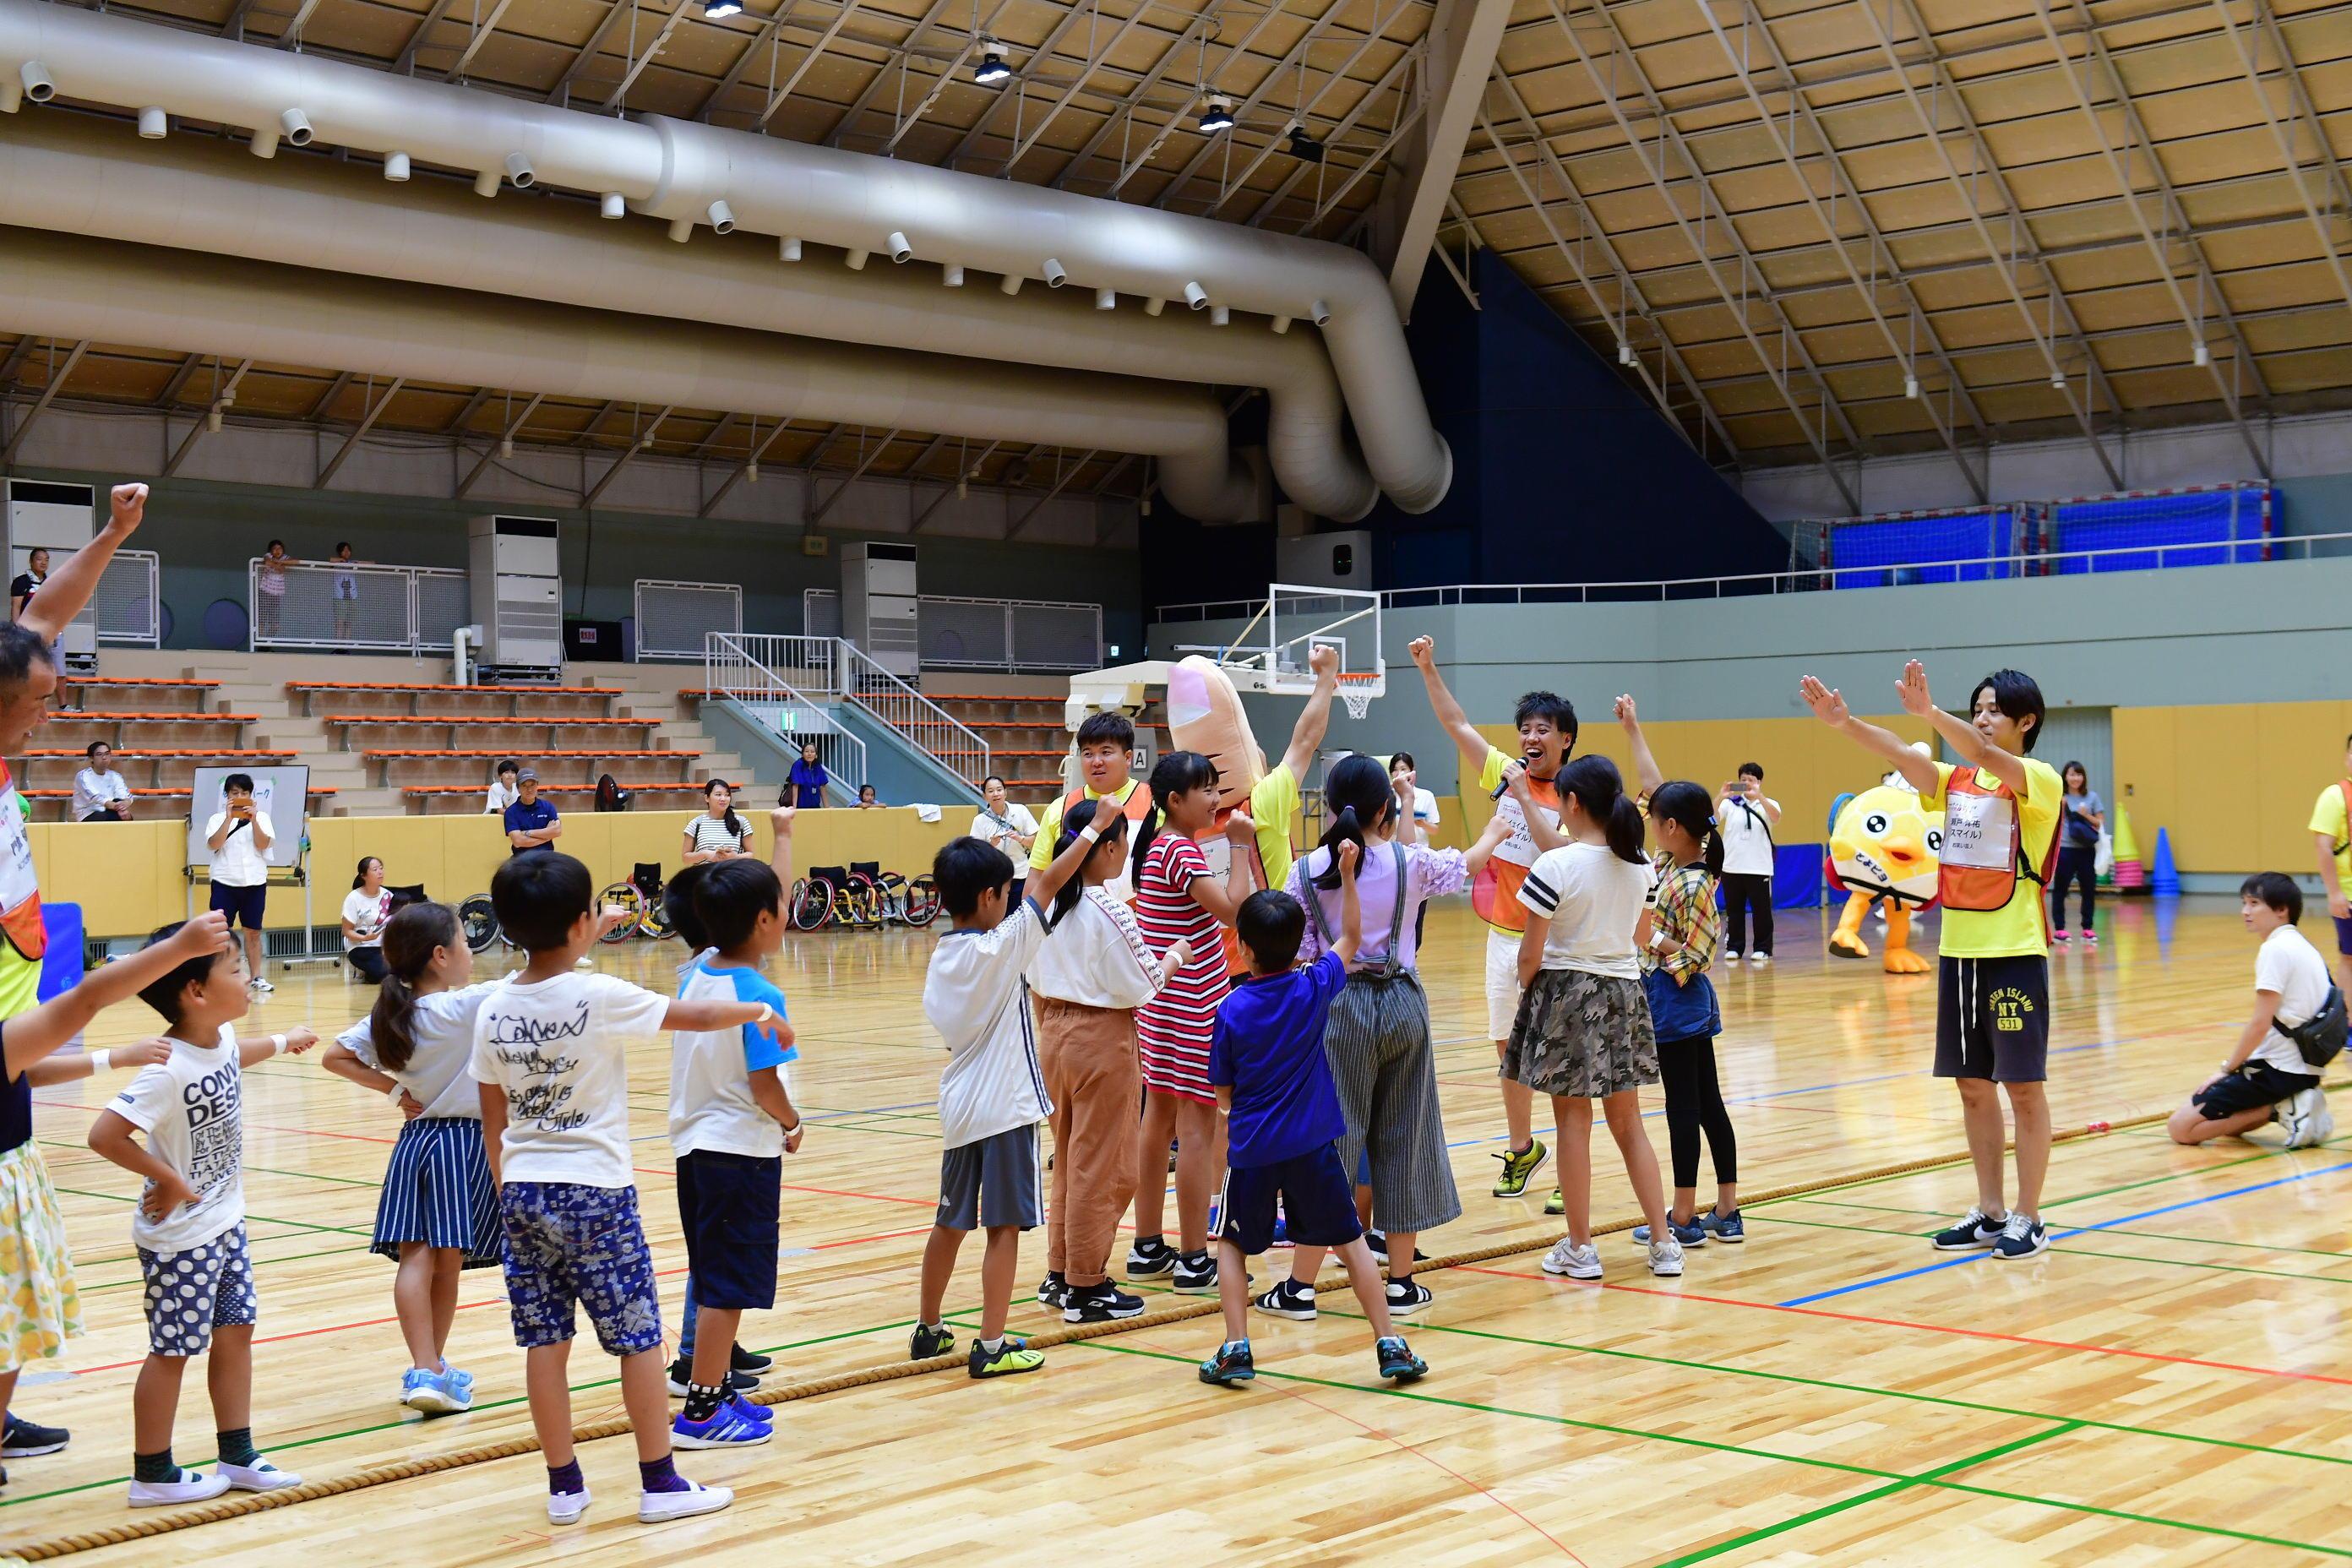 http://news.yoshimoto.co.jp/20181008192853-947dee697c893ec93279d116807890ee111d0130.jpg